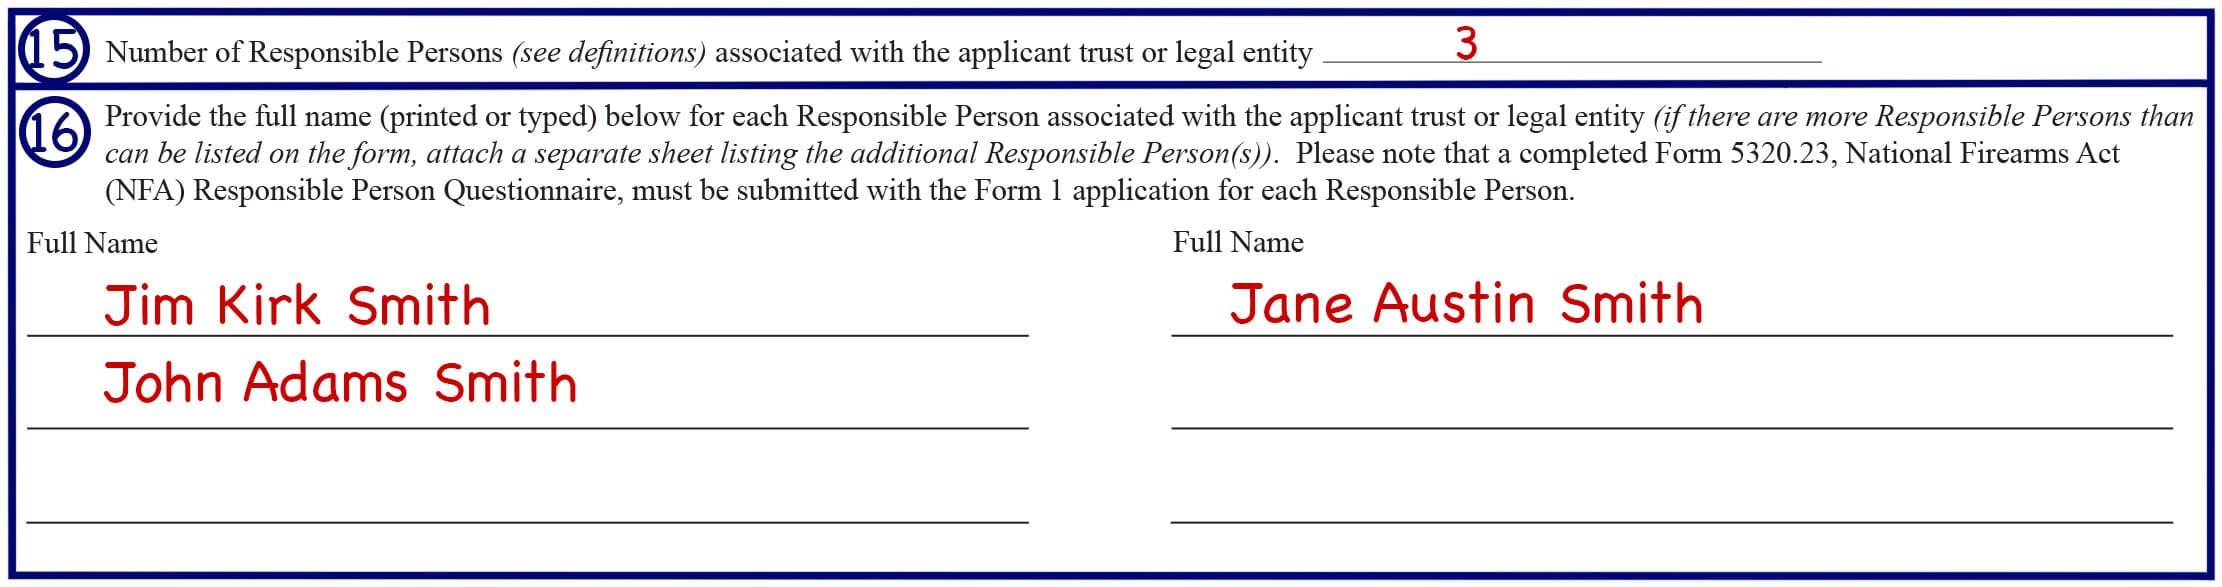 Form 1 Box 15-16